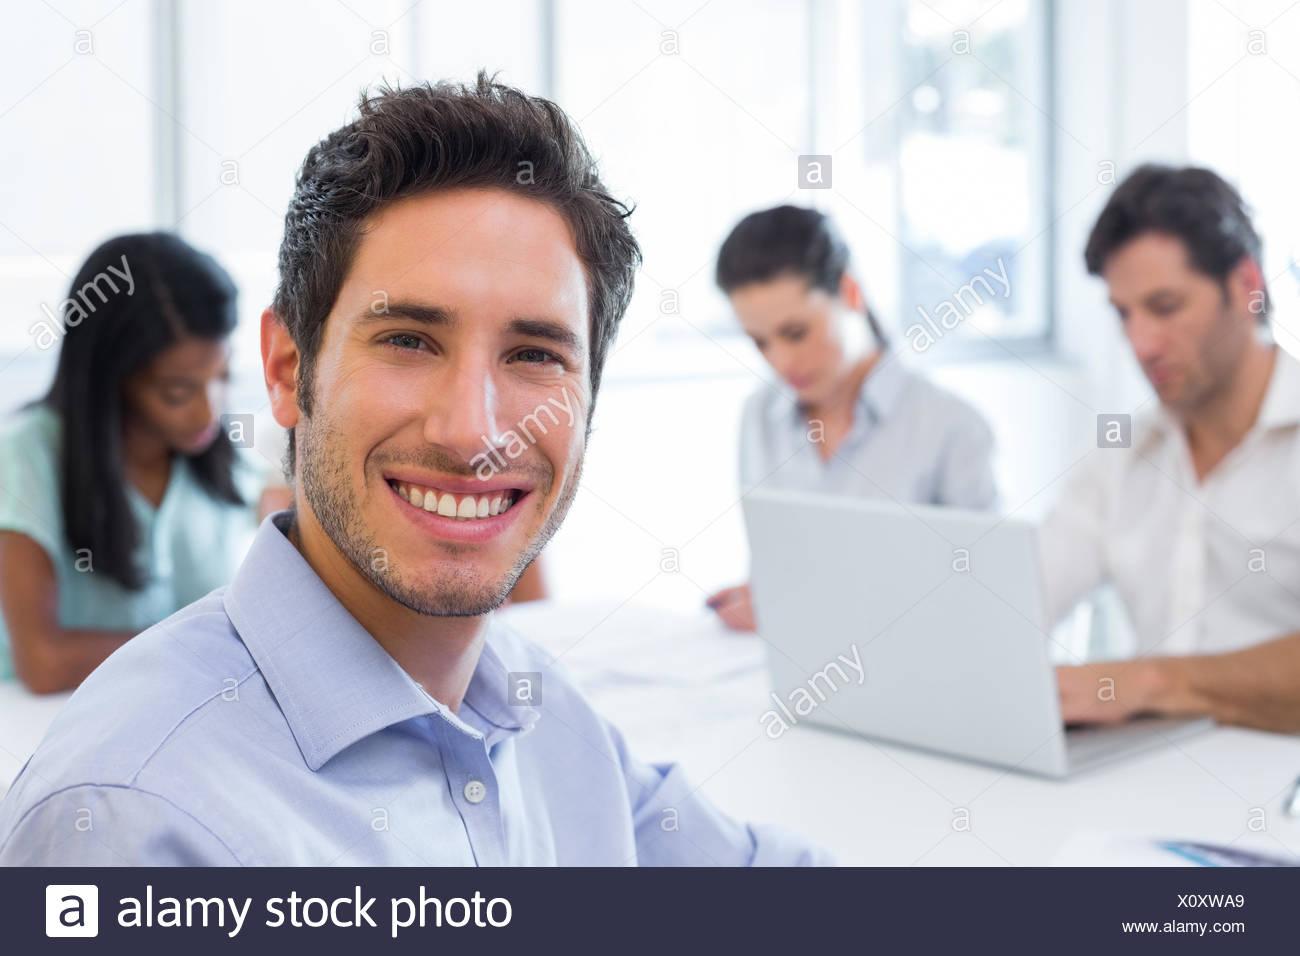 Attraktive Geschäftsmann lächelnd am Arbeitsplatz Stockbild